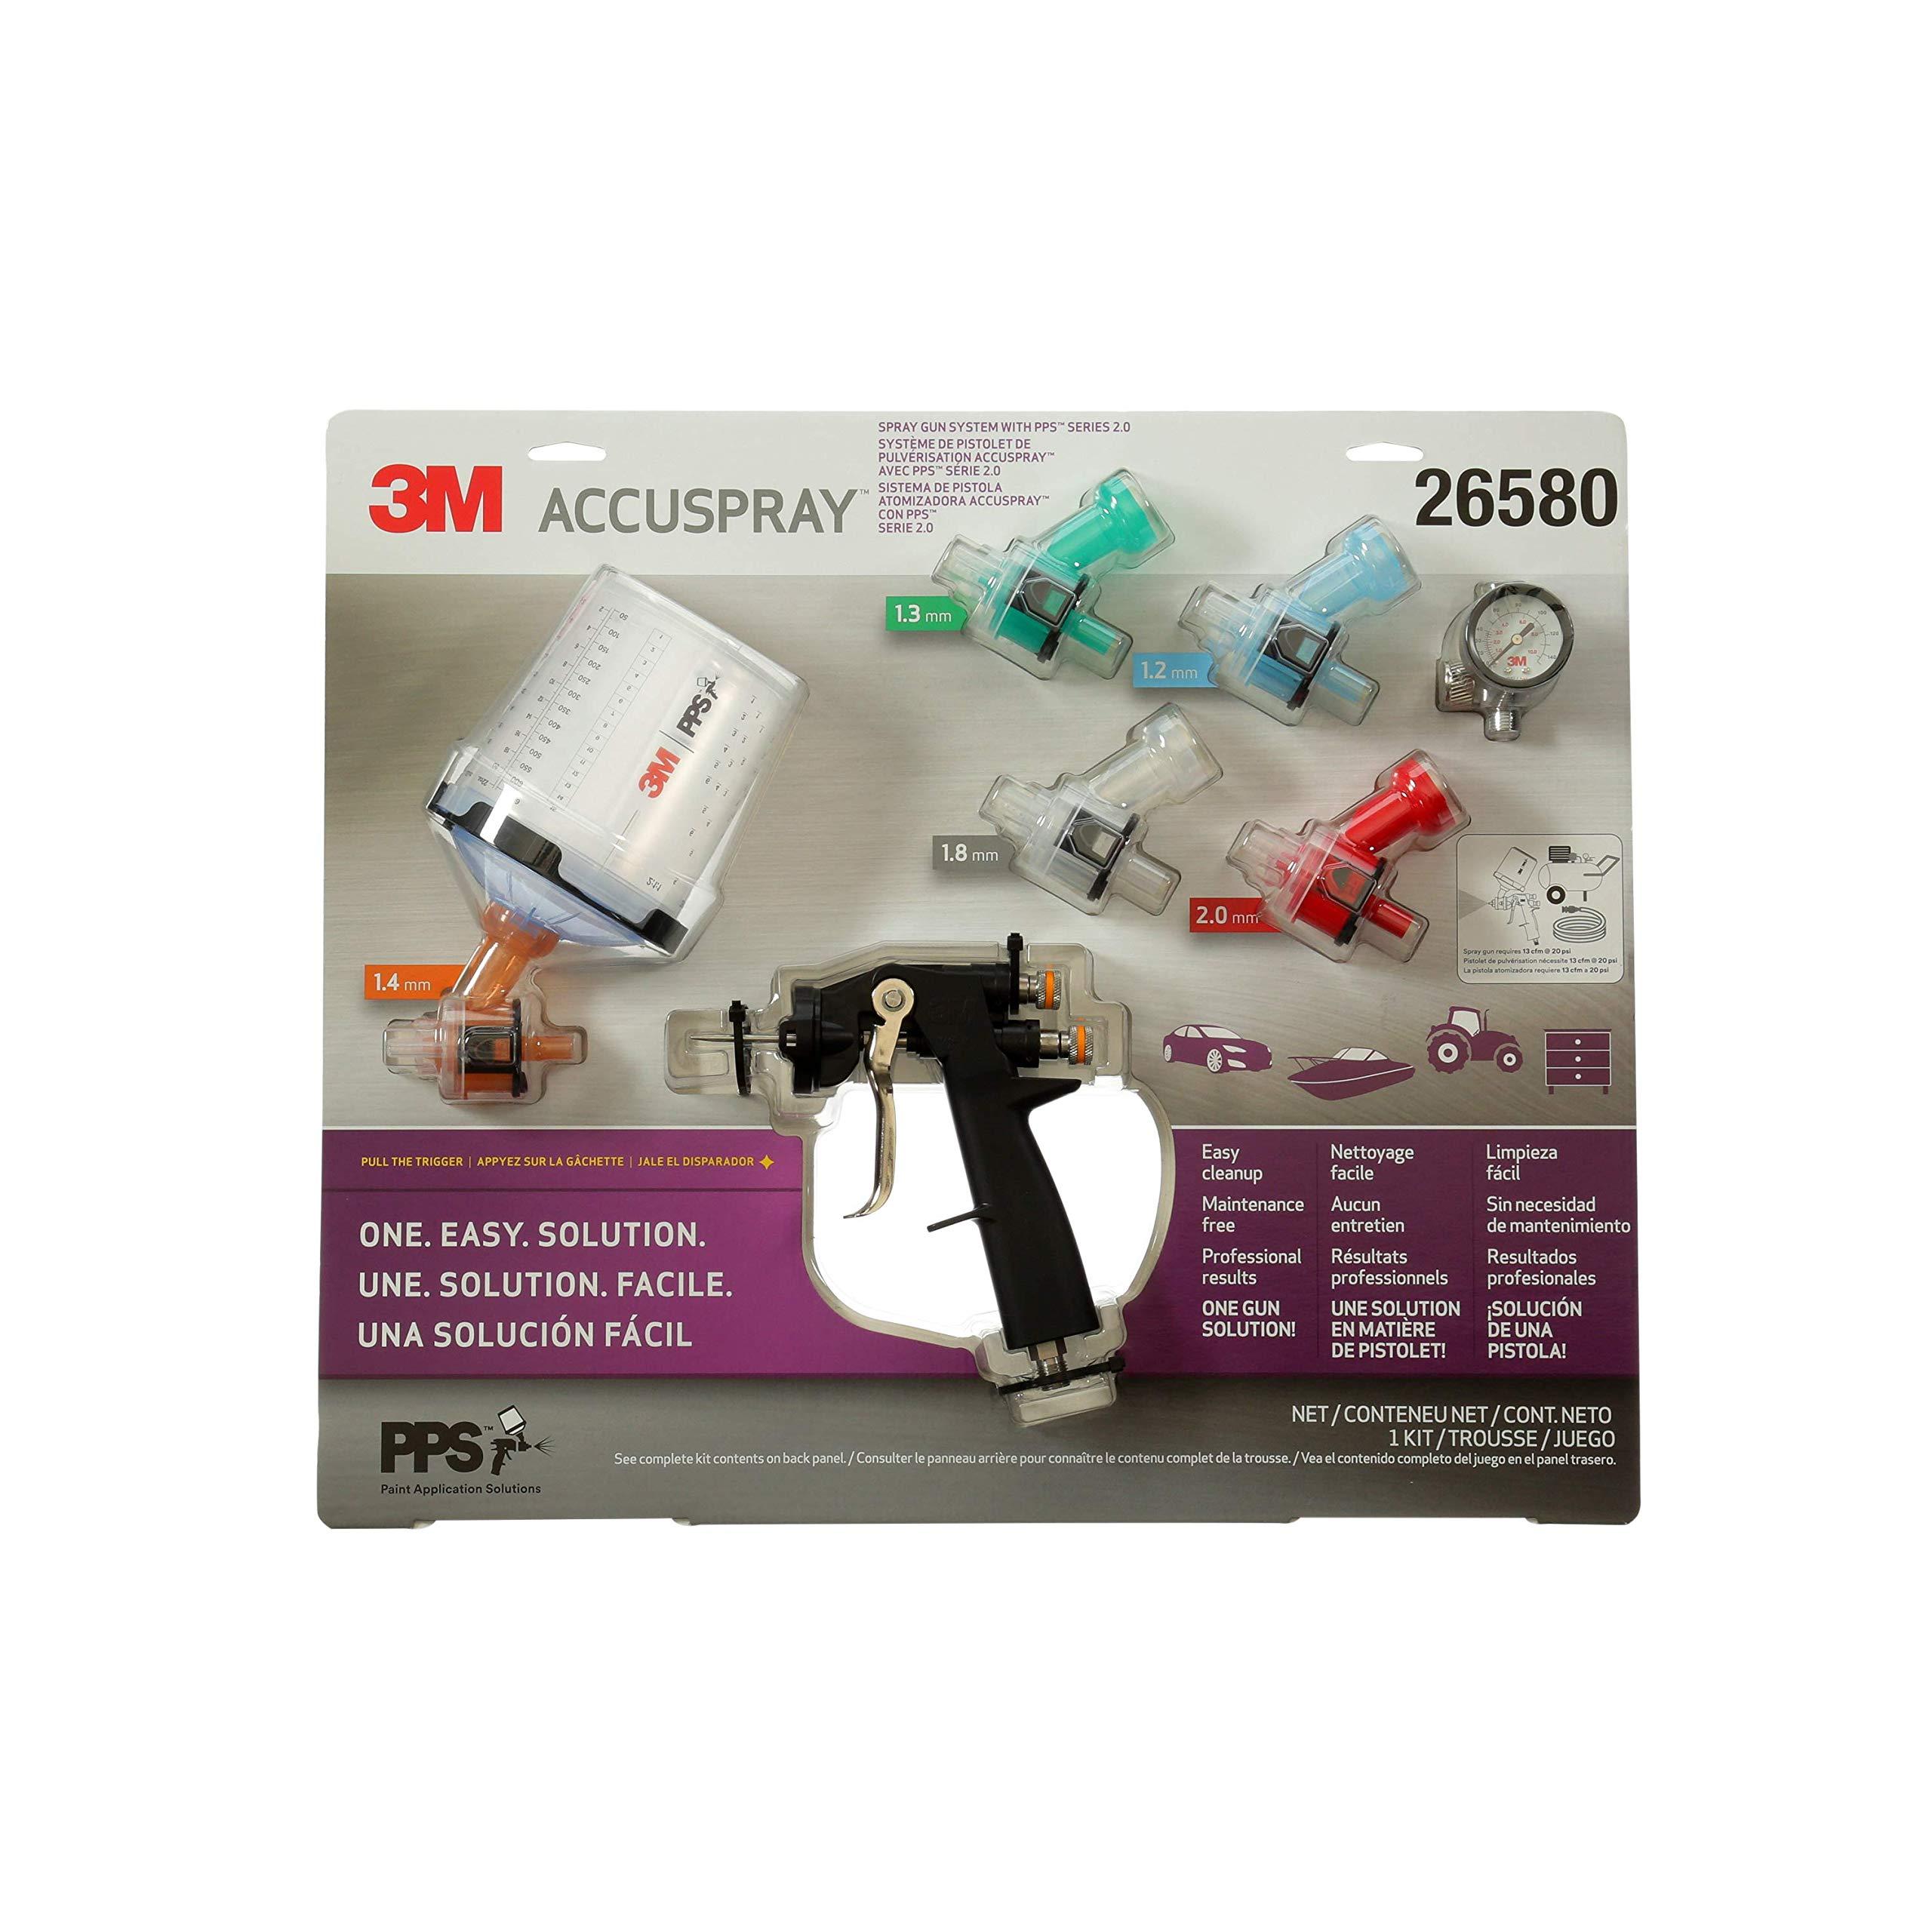 3M 26580 Accuspray ONE Spray Gun System